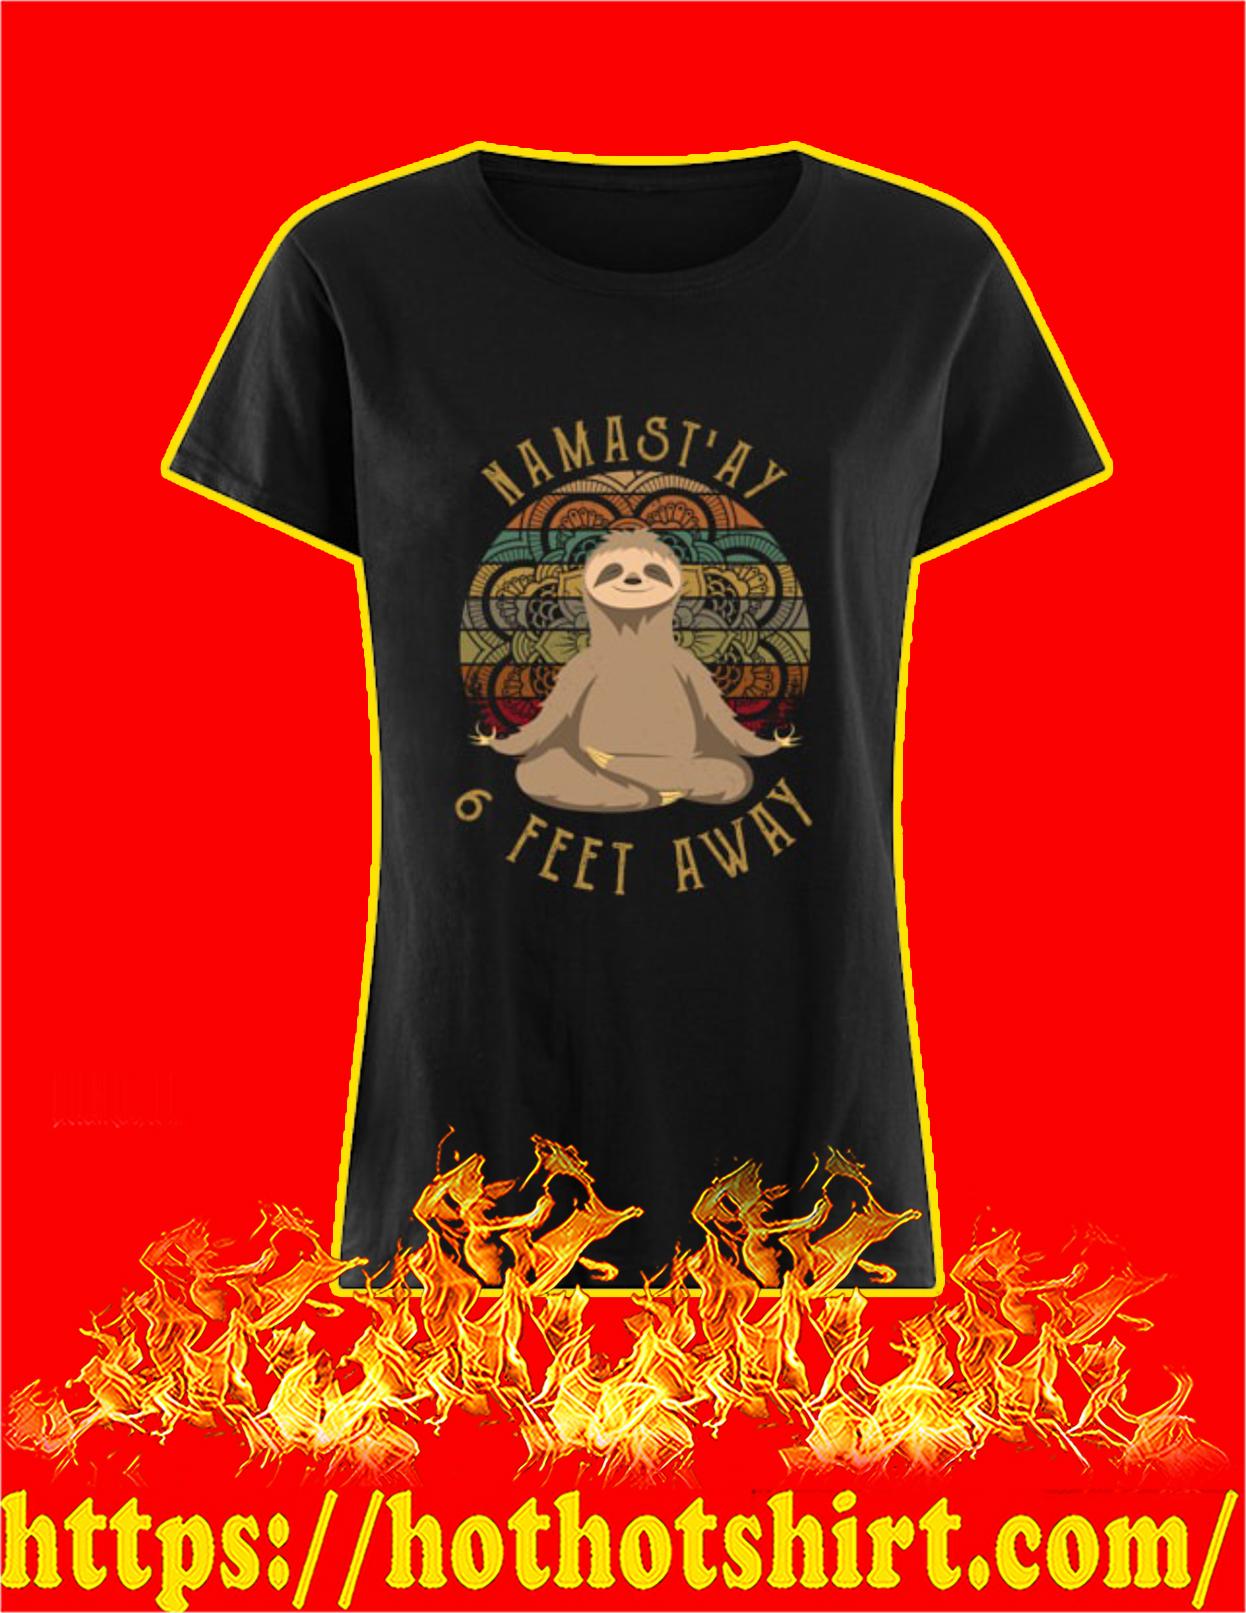 Sloth namast'ay 6 feet away women shirt